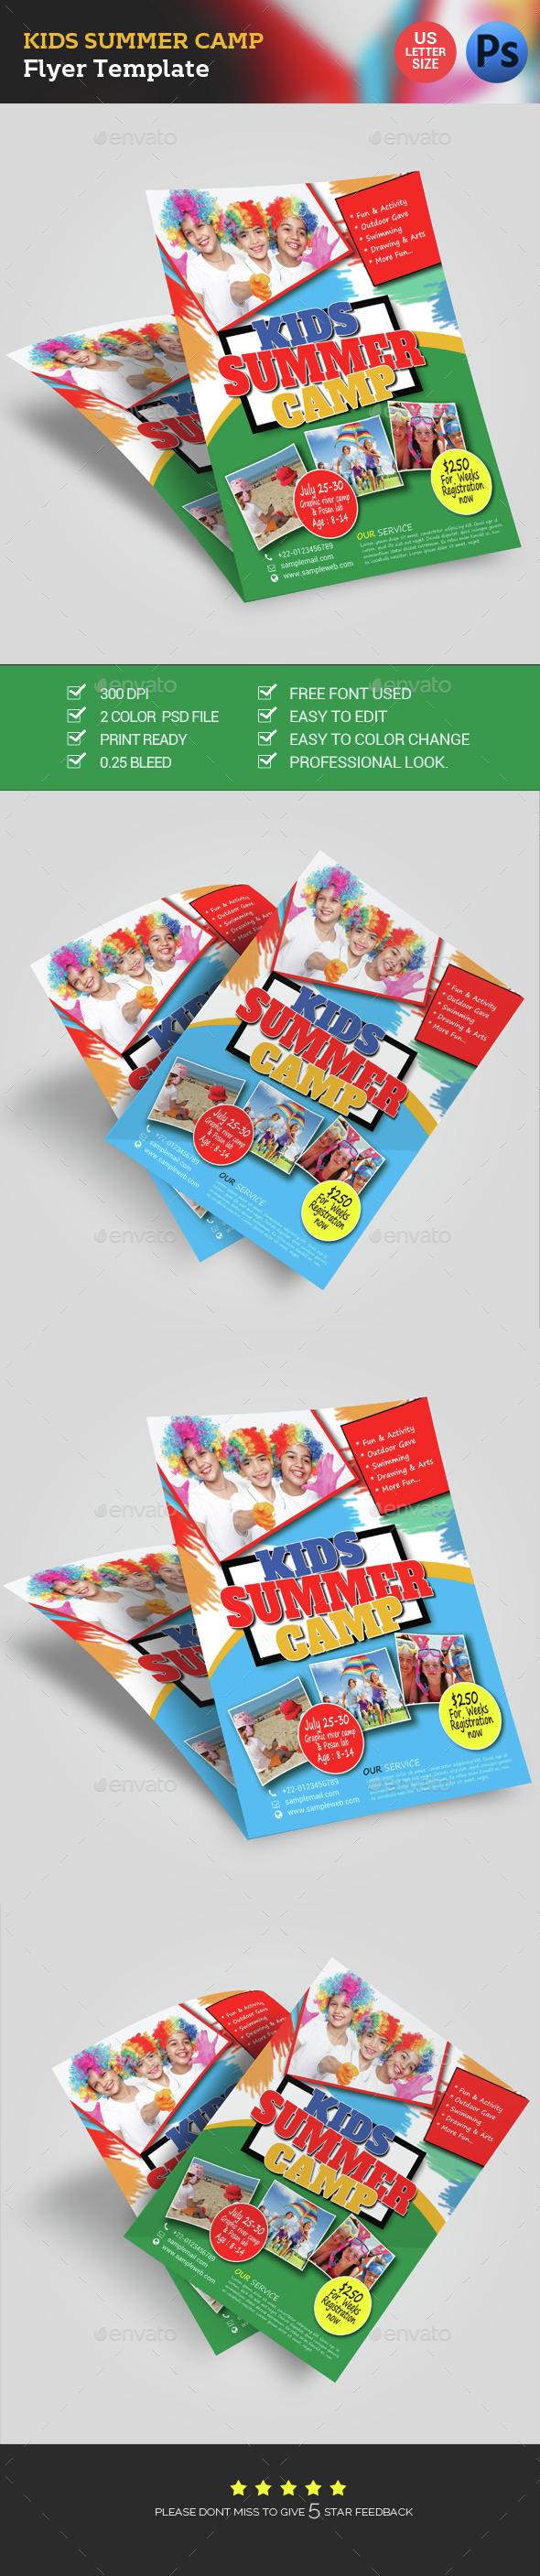 Kids Summer Camp Fest Flyer - Flyers Print Templates